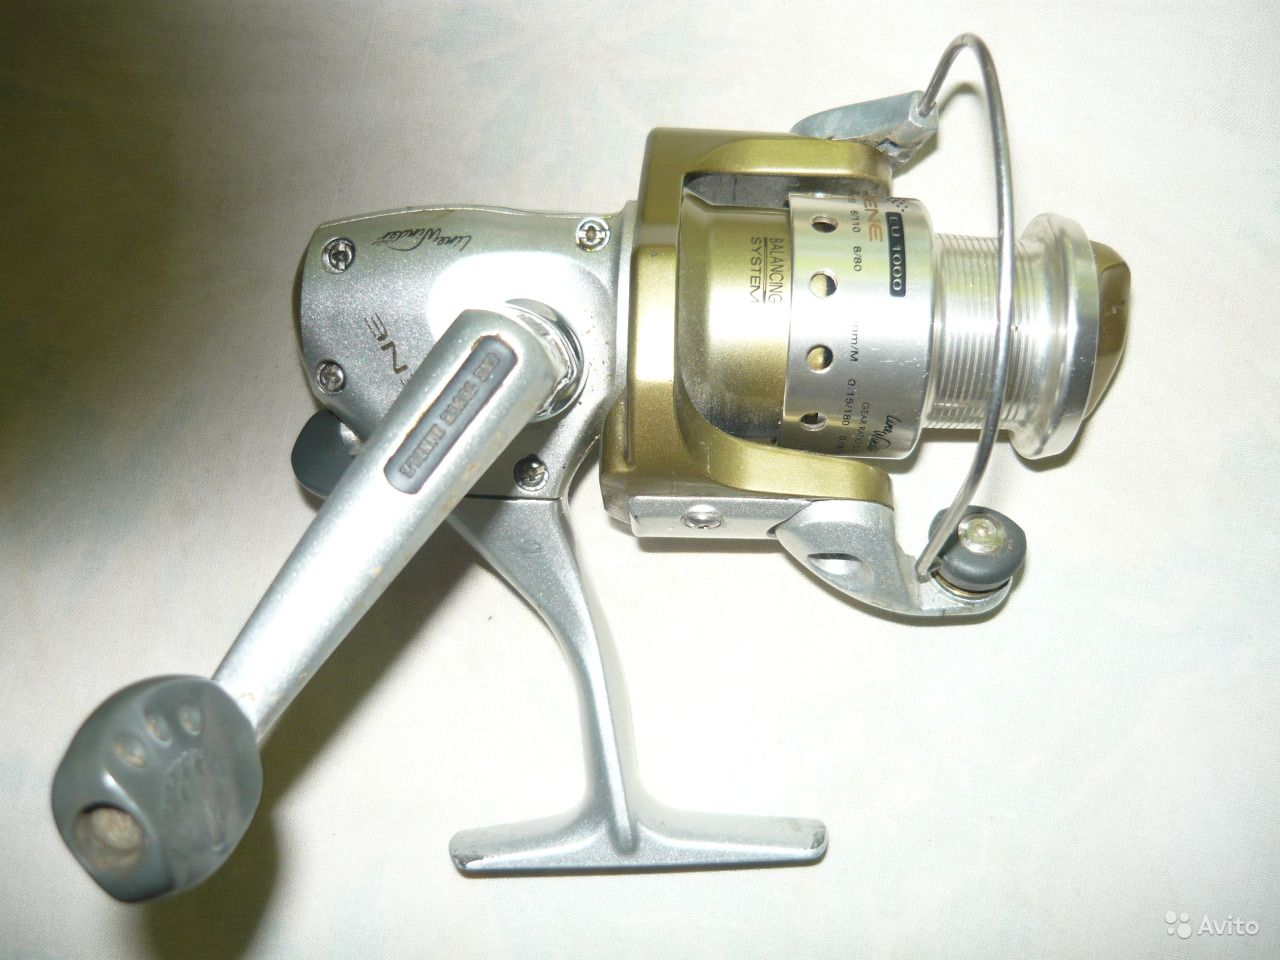 Washing line winder thermostatic shower system